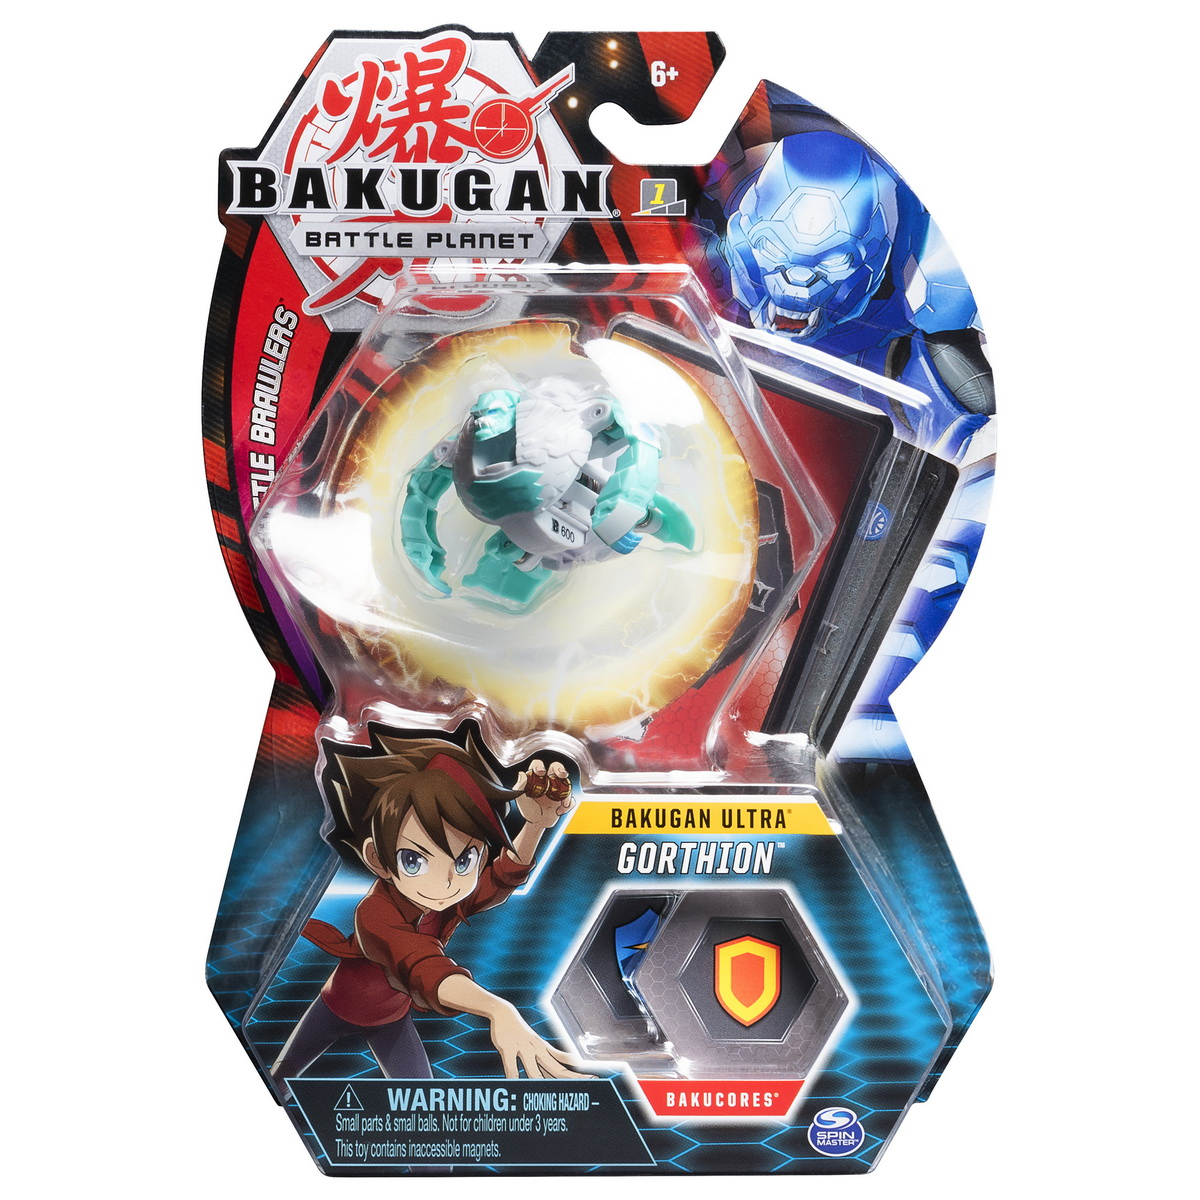 Bakugan Ultra Bila Gorthion